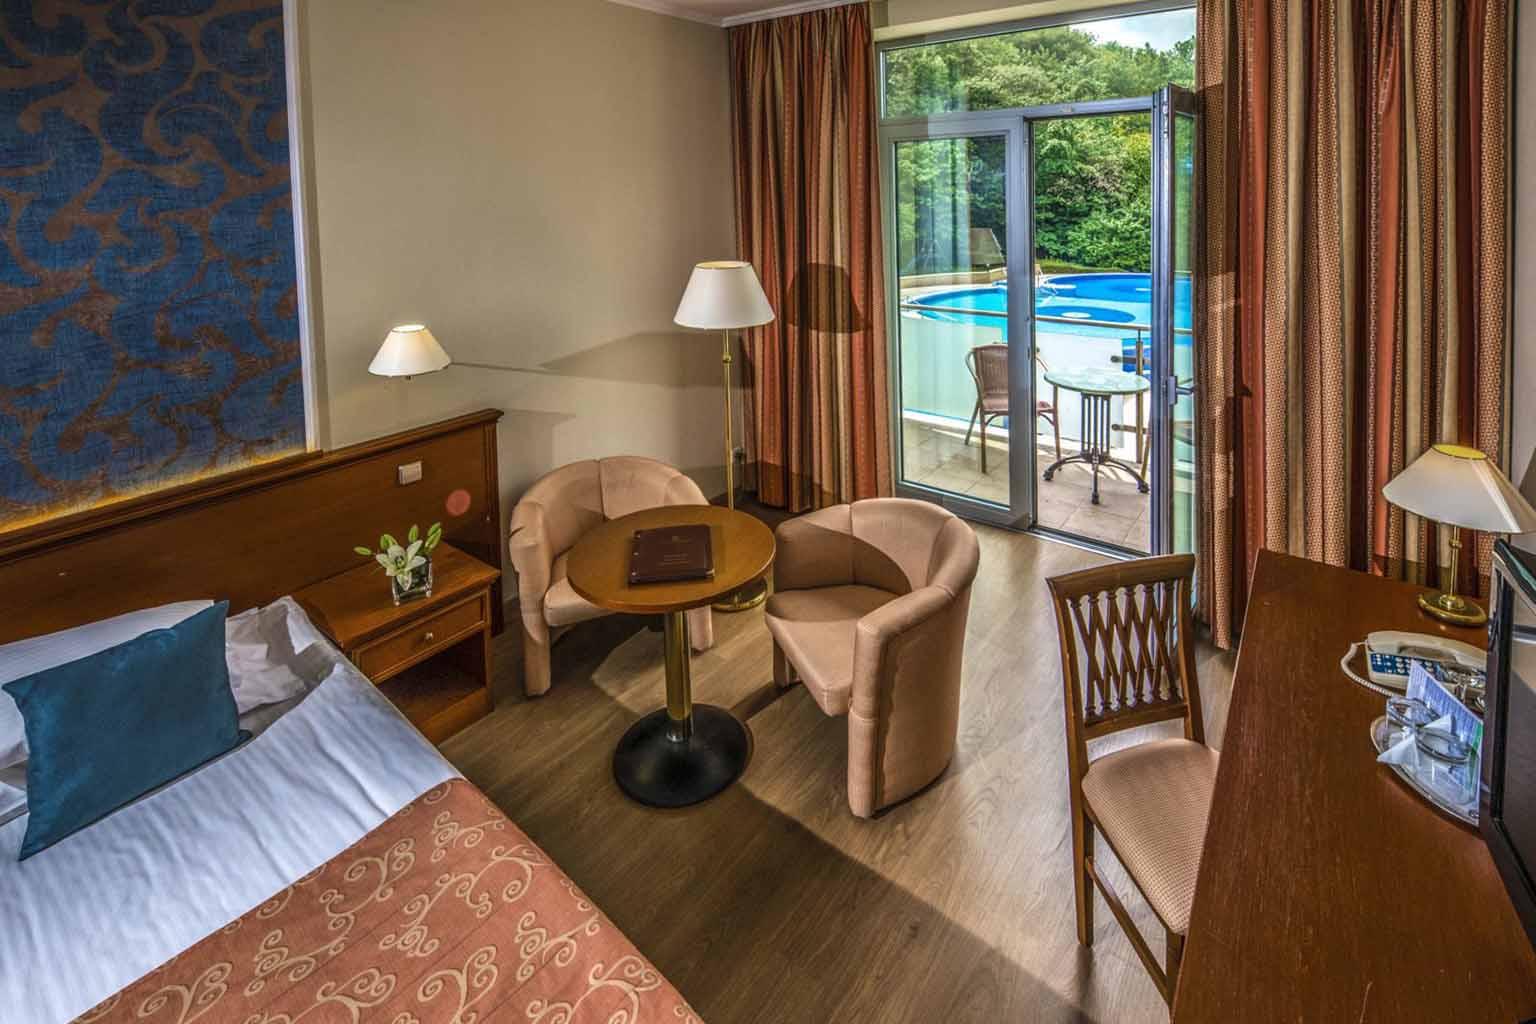 thermal-hotel-visegrad-szalloda-park-oldali-ketagyas-szoba3